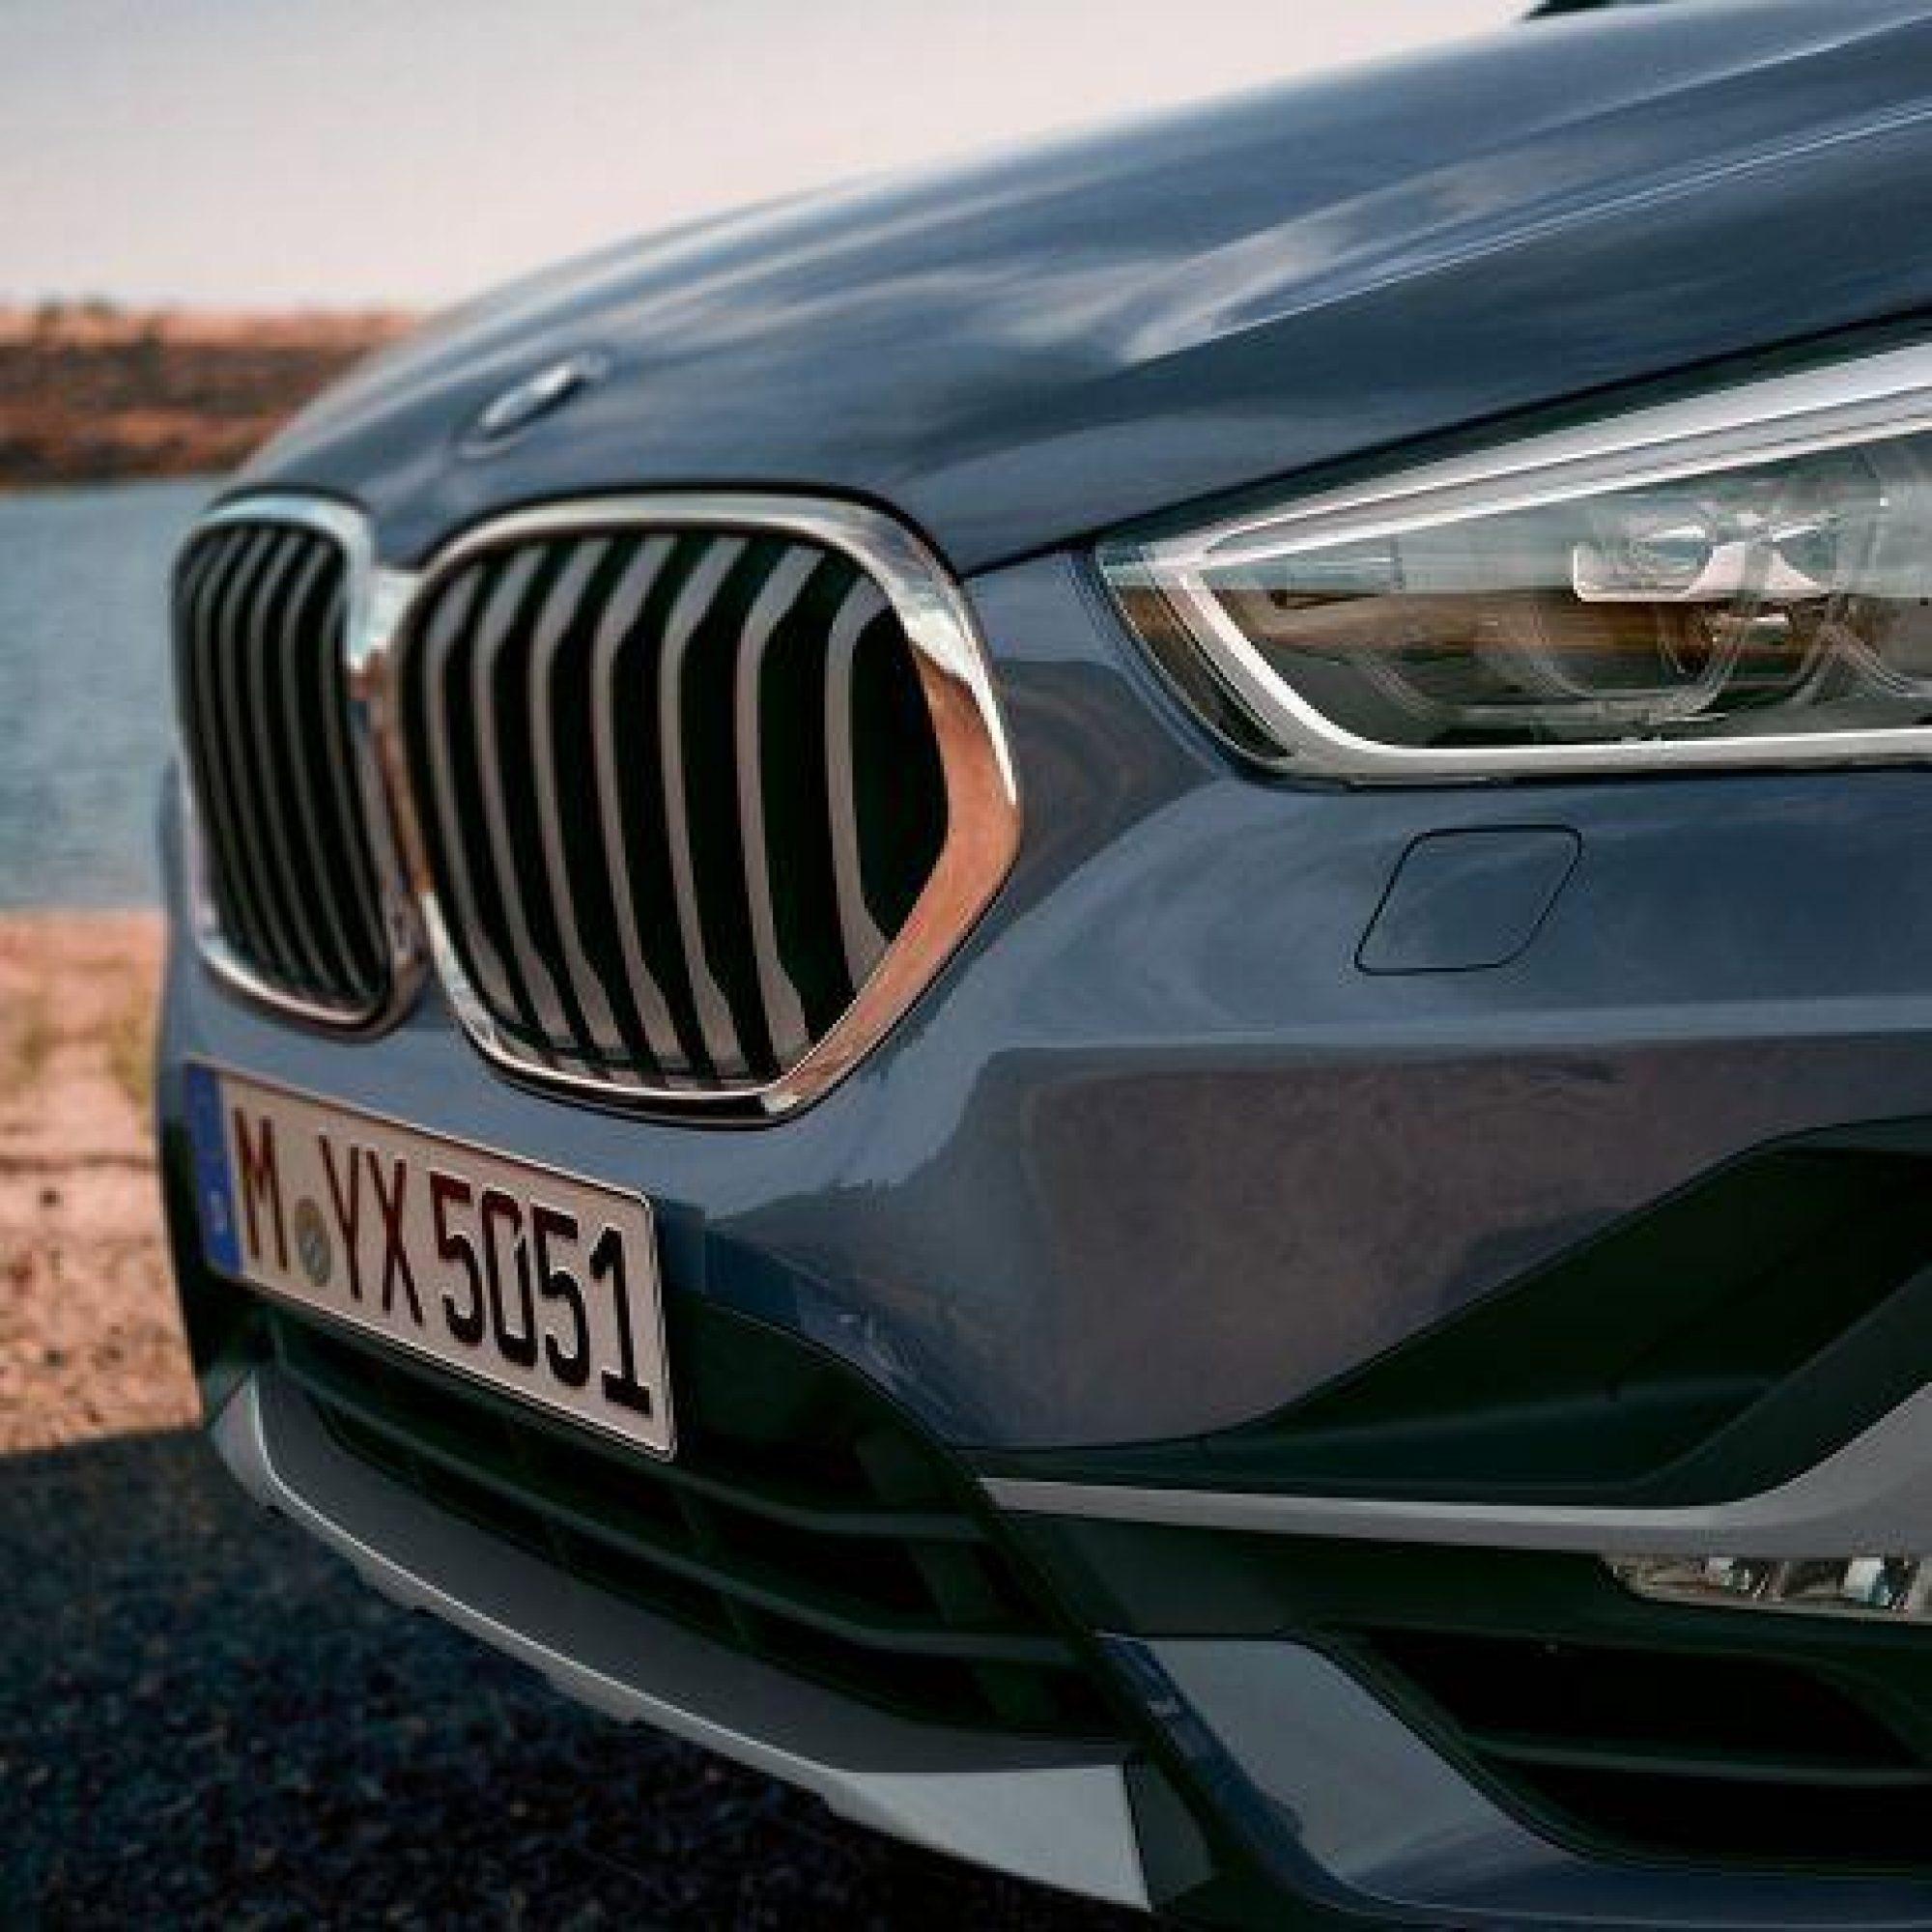 BMW X7 Carden Park 4